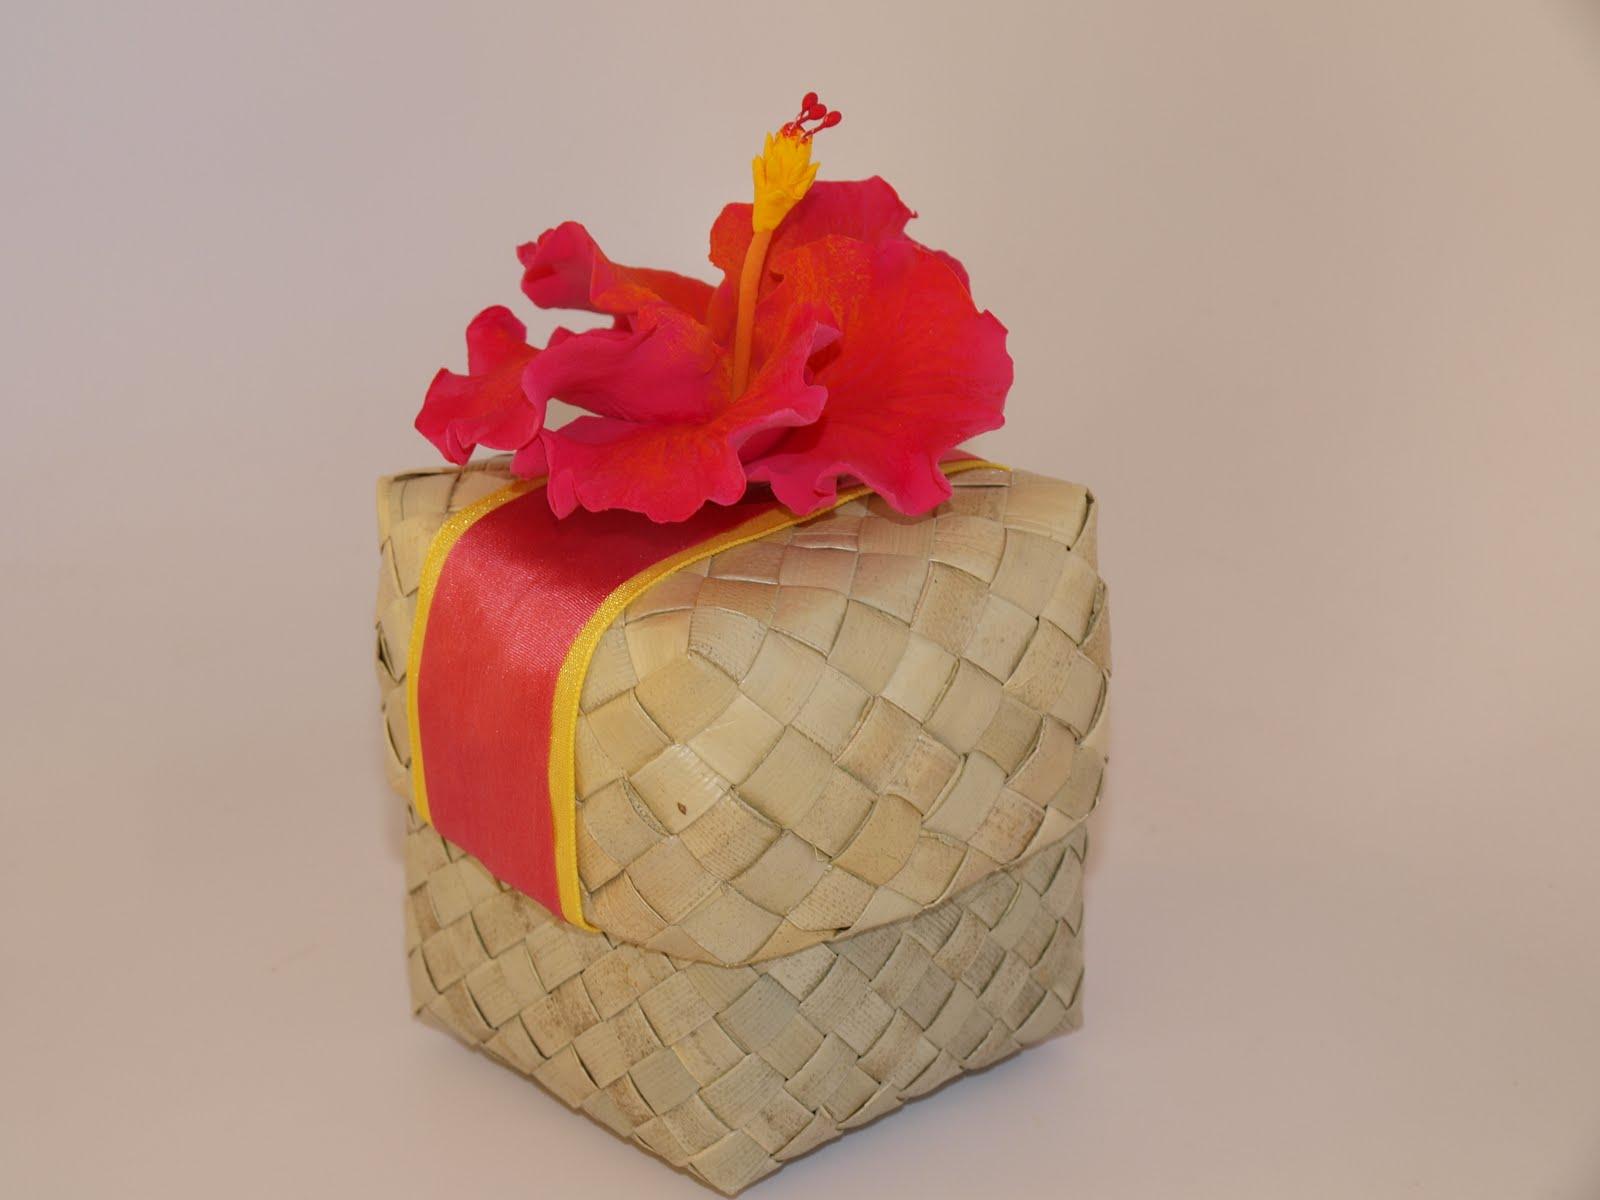 Hawaiian Wedding Favor Boxes : ... , Eco-Friendly Wedding Favors, Lauhala Box, Lauhala Wedding Favor Box